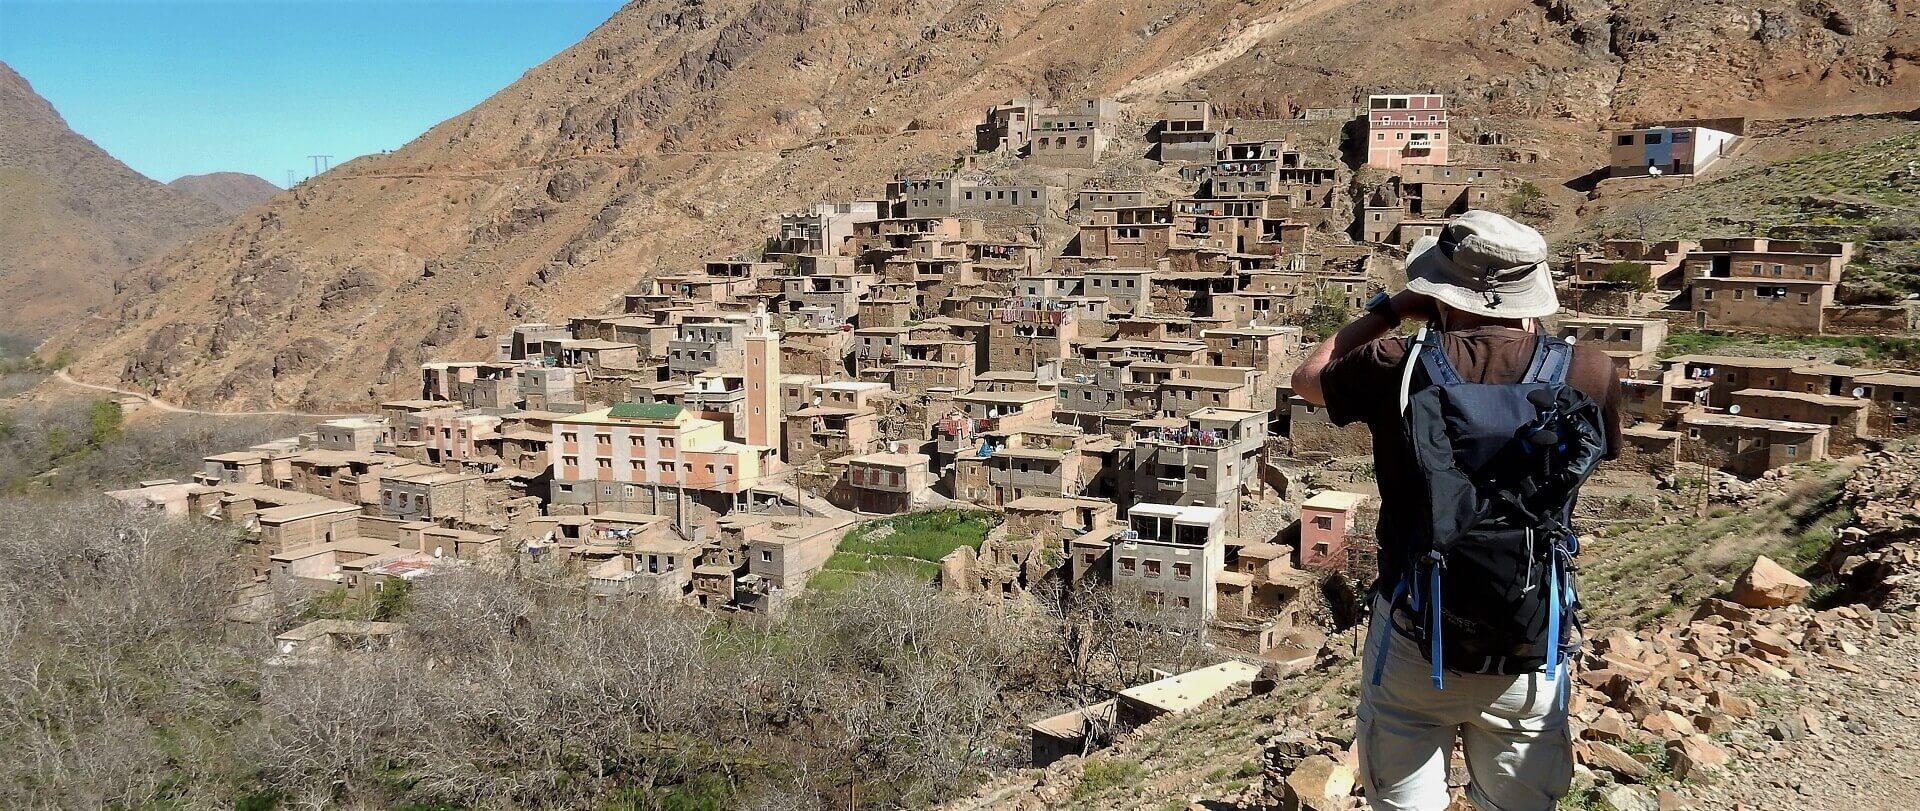 Atlasbjergenes berberlandsbyer